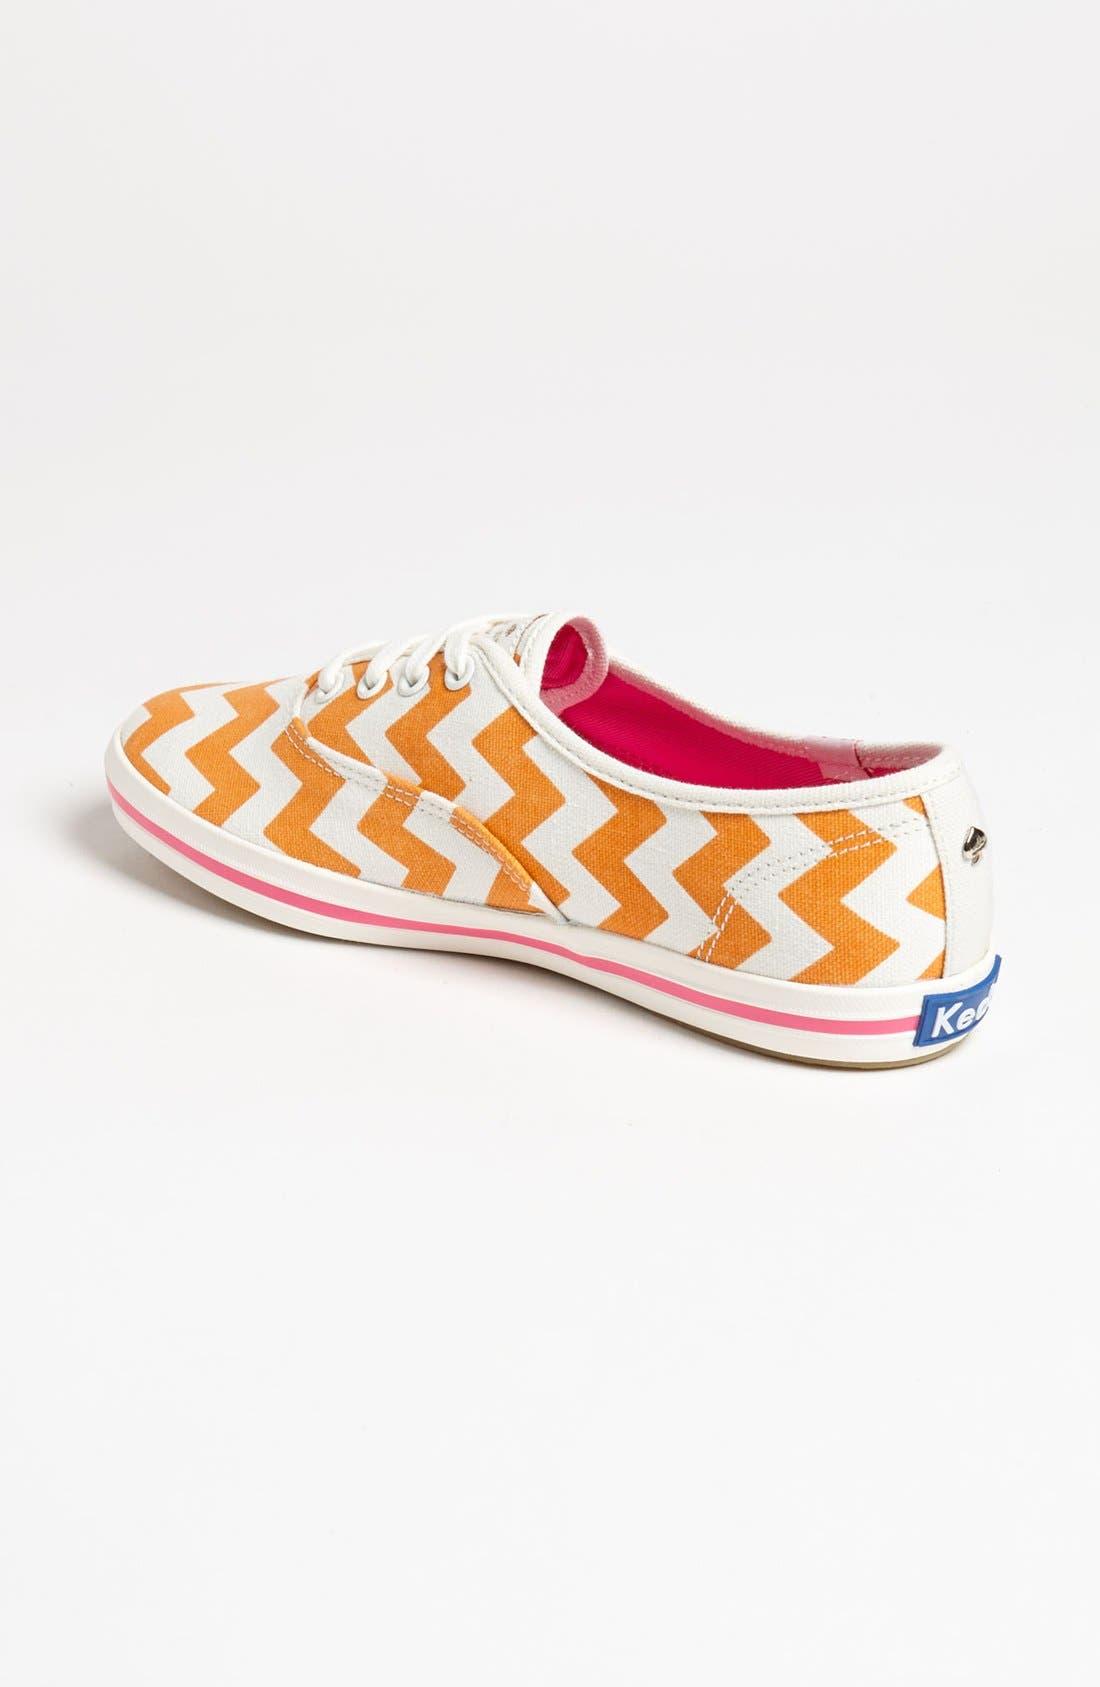 Keds<sup>®</sup> for kate spade new york 'kick' sneaker,                             Alternate thumbnail 12, color,